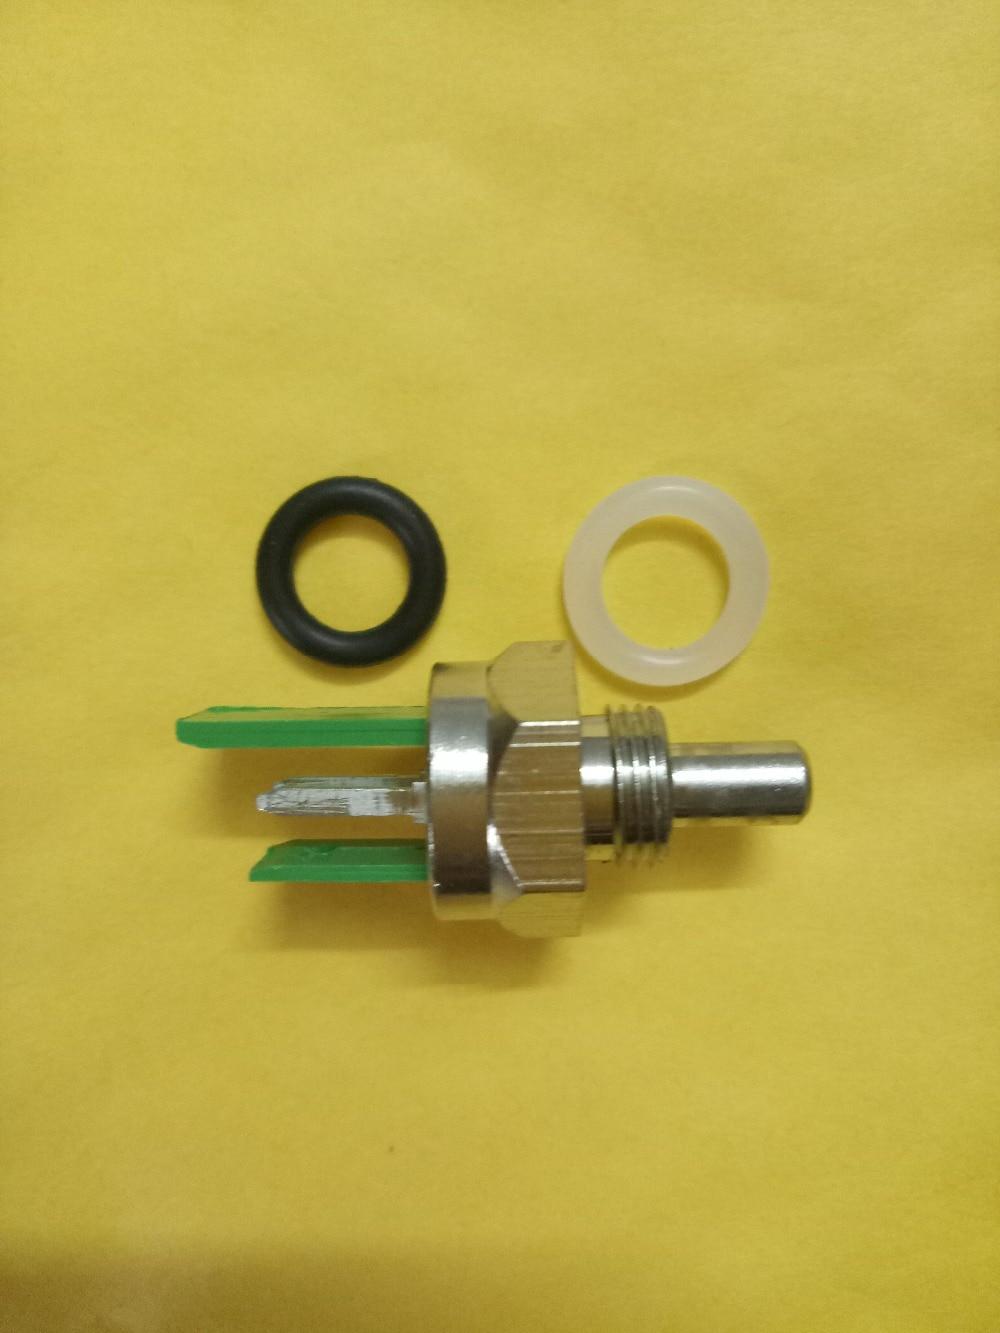 Free shipping/ 1 set new Boiler NTC 10K temperature sensor chip/have 2pcs Sealed ring/for Ariston